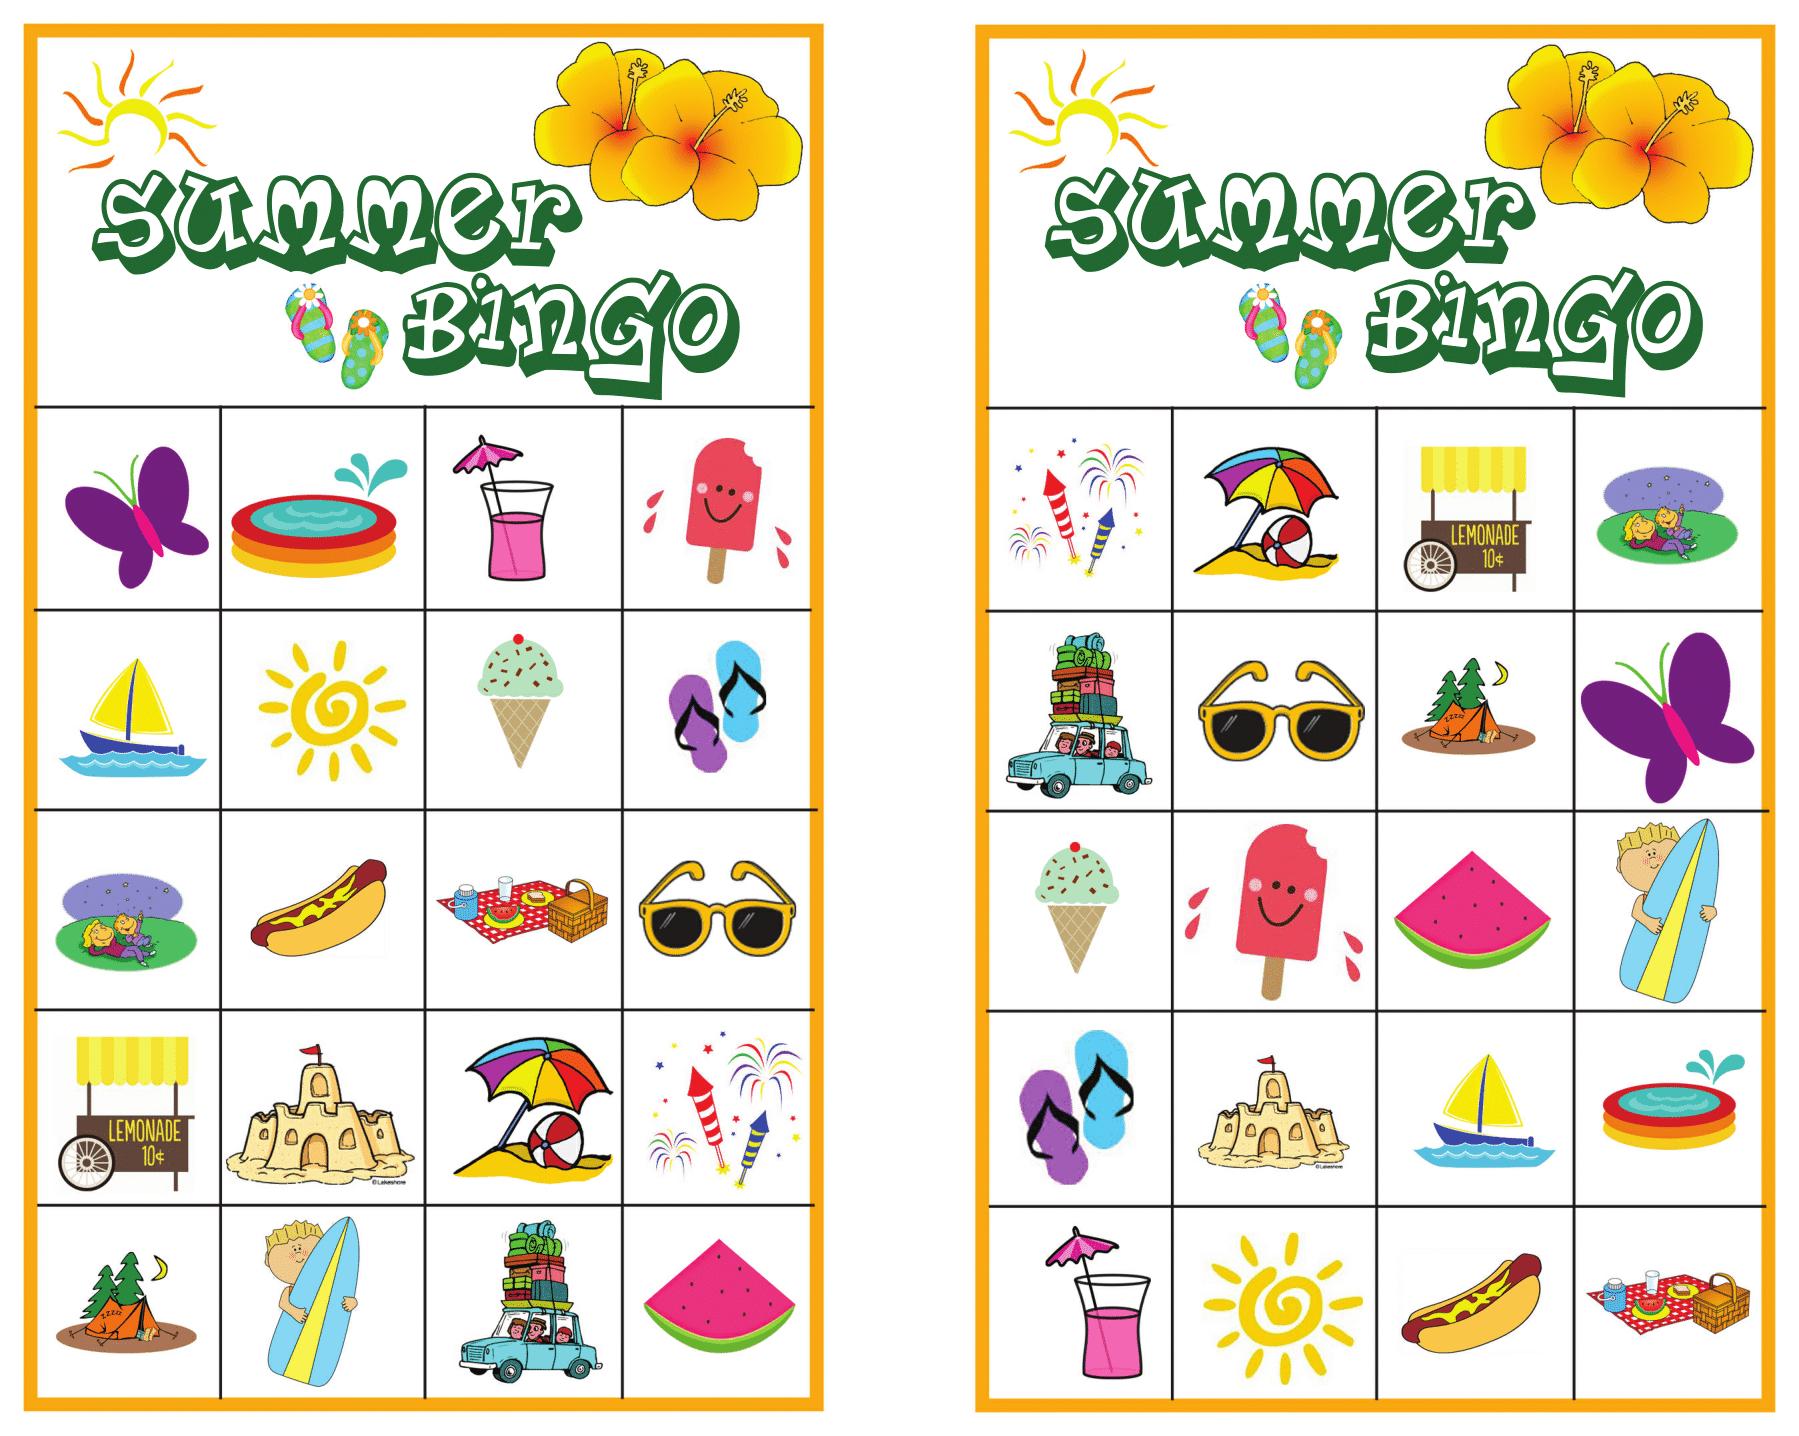 Summer Bingo Game With Free Printables - Free Printable Bingo